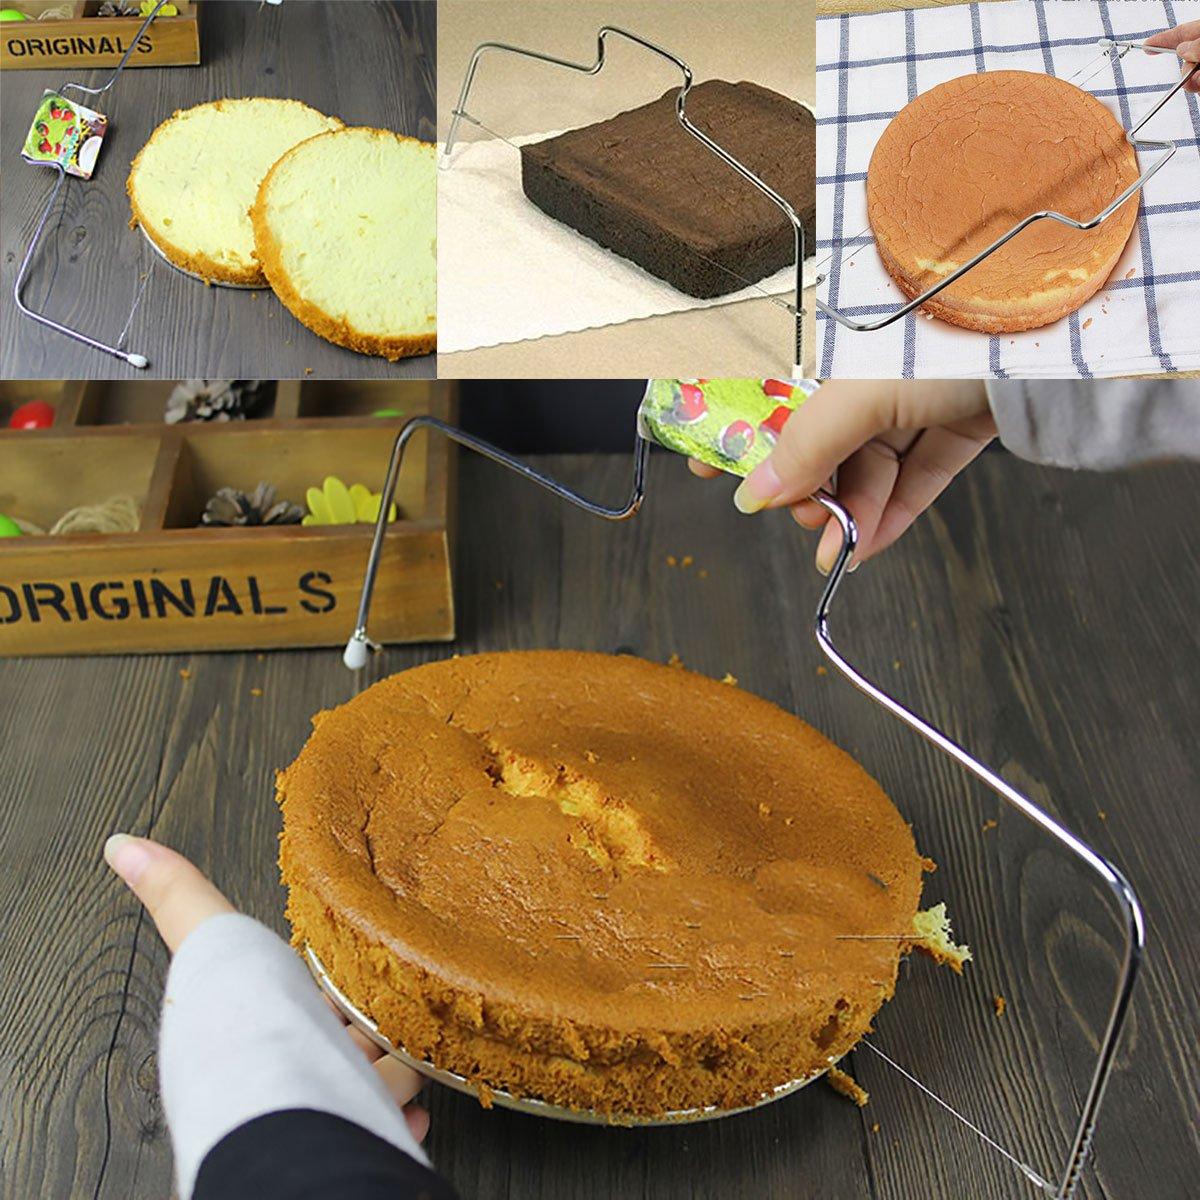 IEFIEL Stainless Steel 2-Wire Cake Bread Cutter Slicer Cutting Leveler Decor Kitchen Baking Supplies Adjustable Height 10048925-US